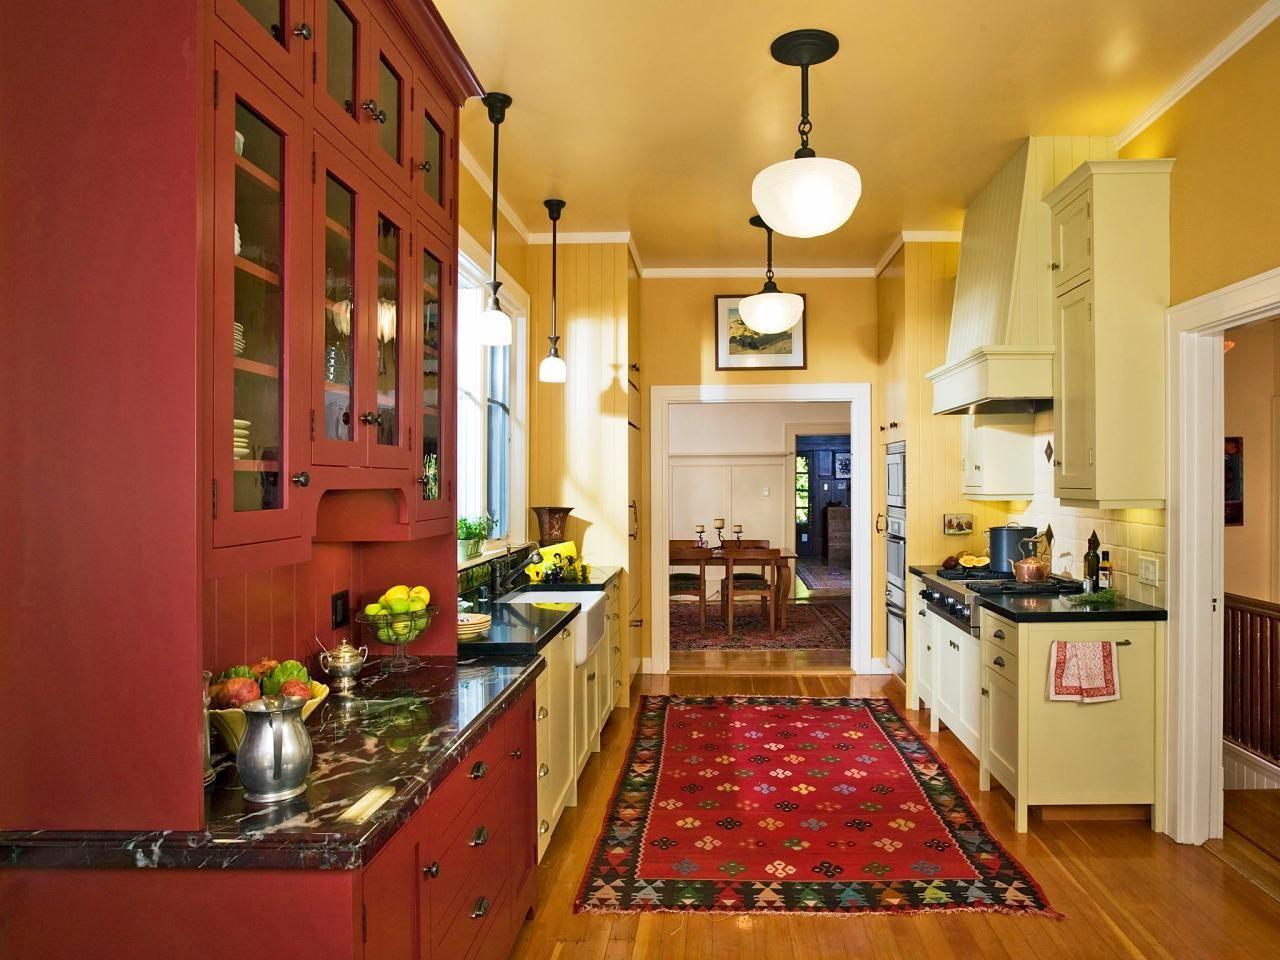 30 colorful kitchen design ideas from | kitchen envy | kitchen